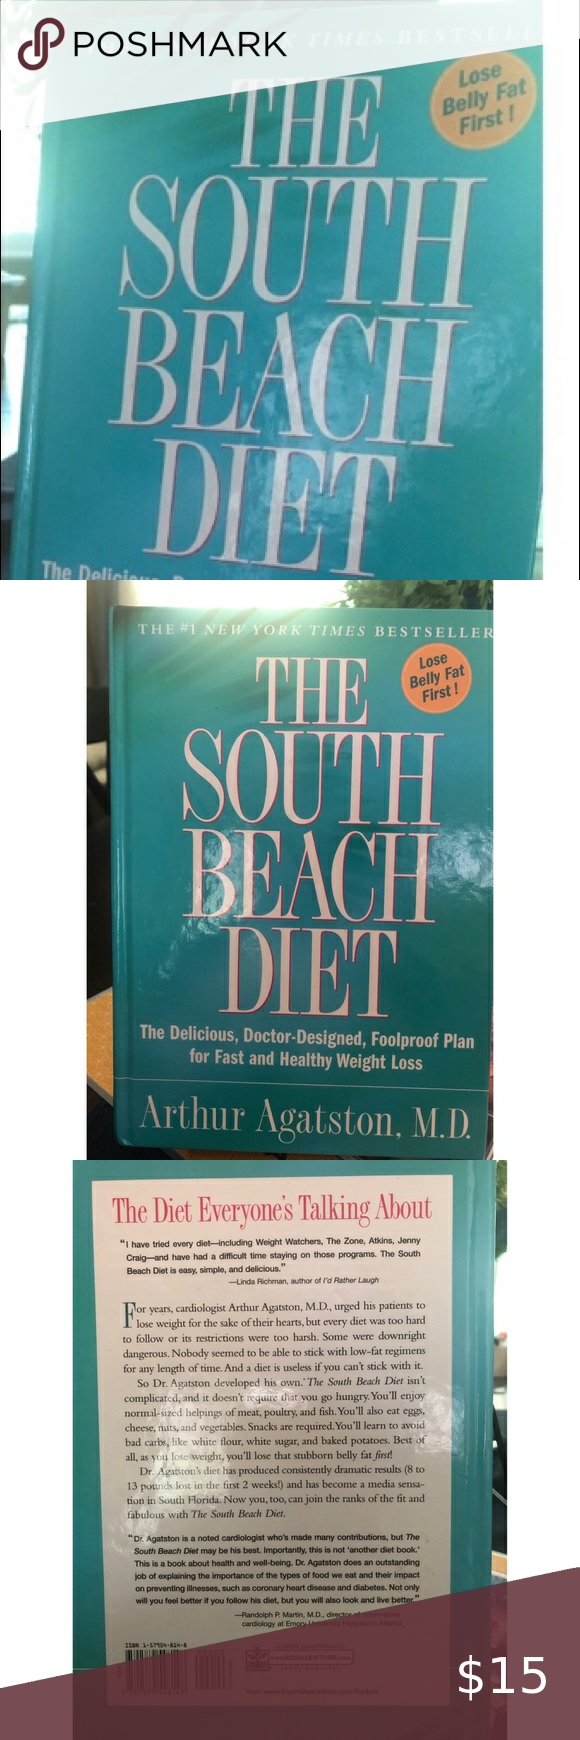 South Beach Diet Book South Beach Diet South Beach Diet Book Diet Books